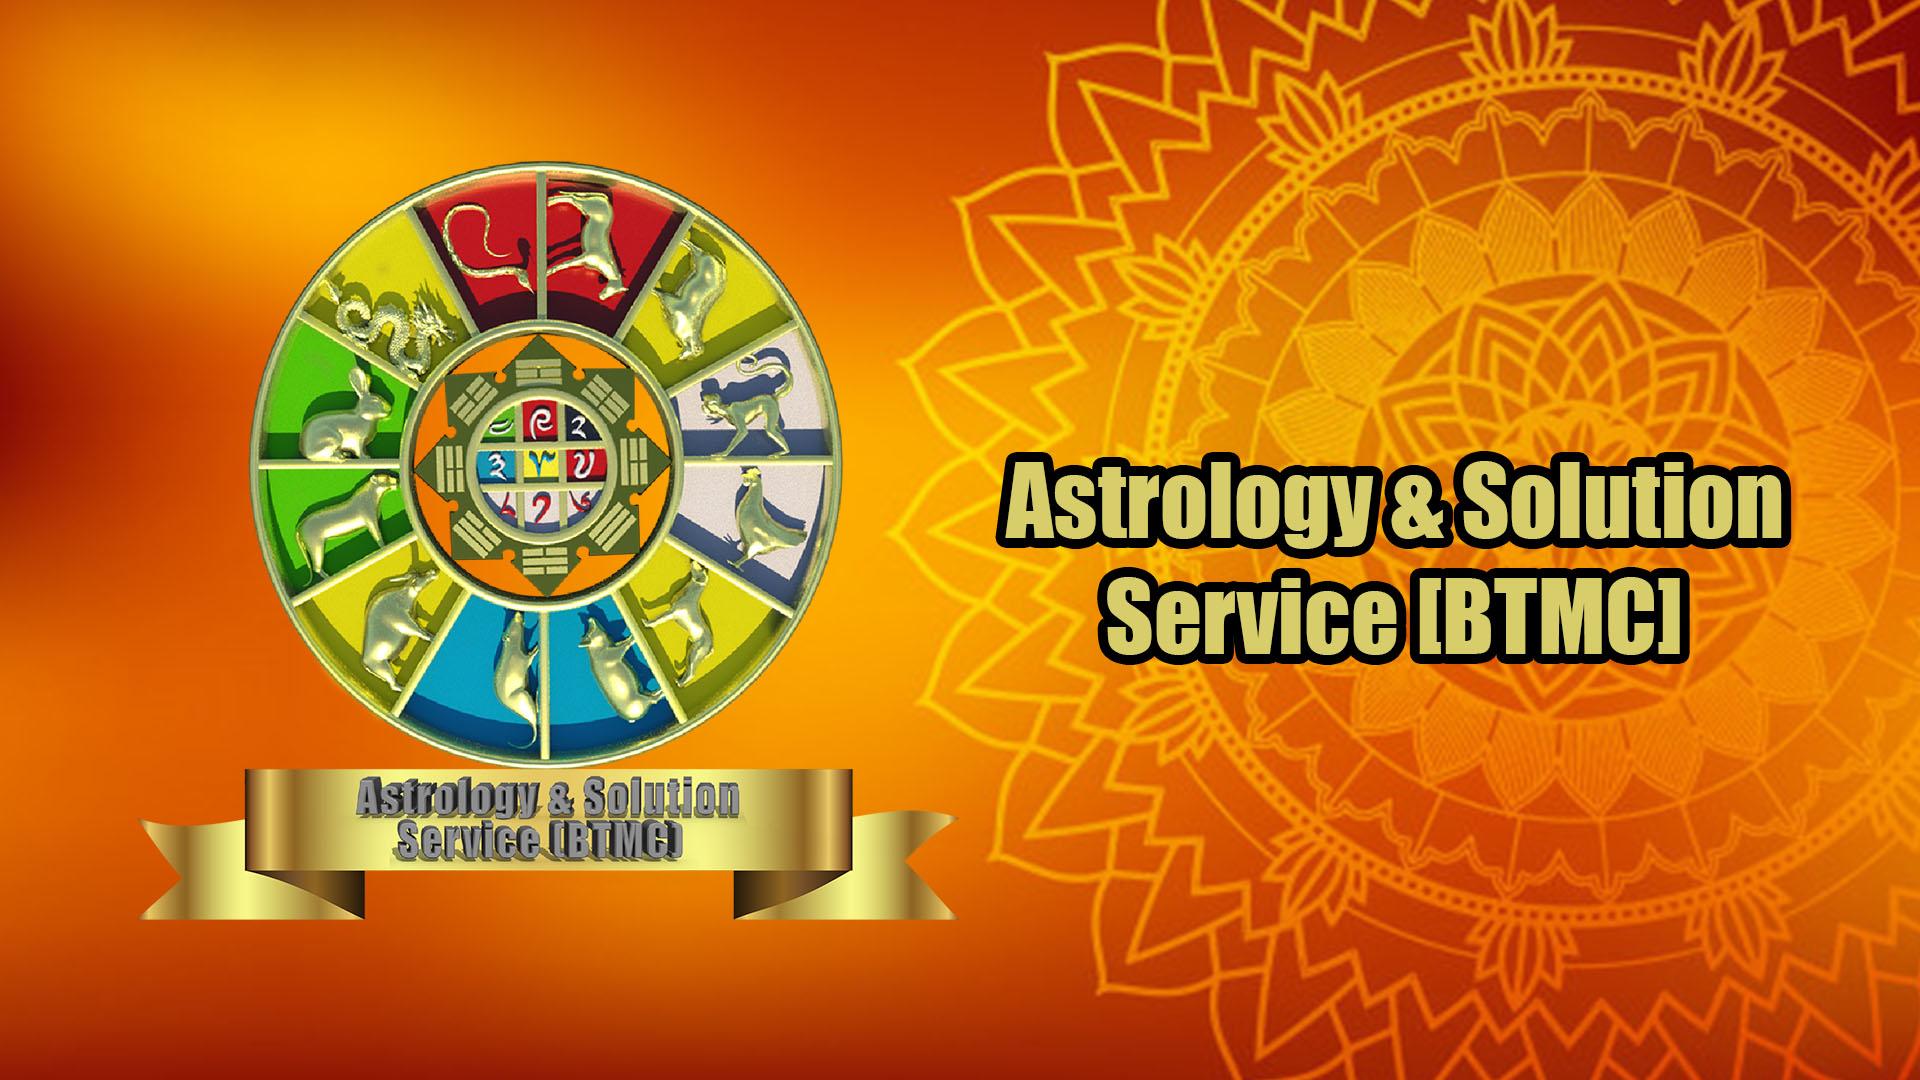 Dharma Astrology & Solution Hub